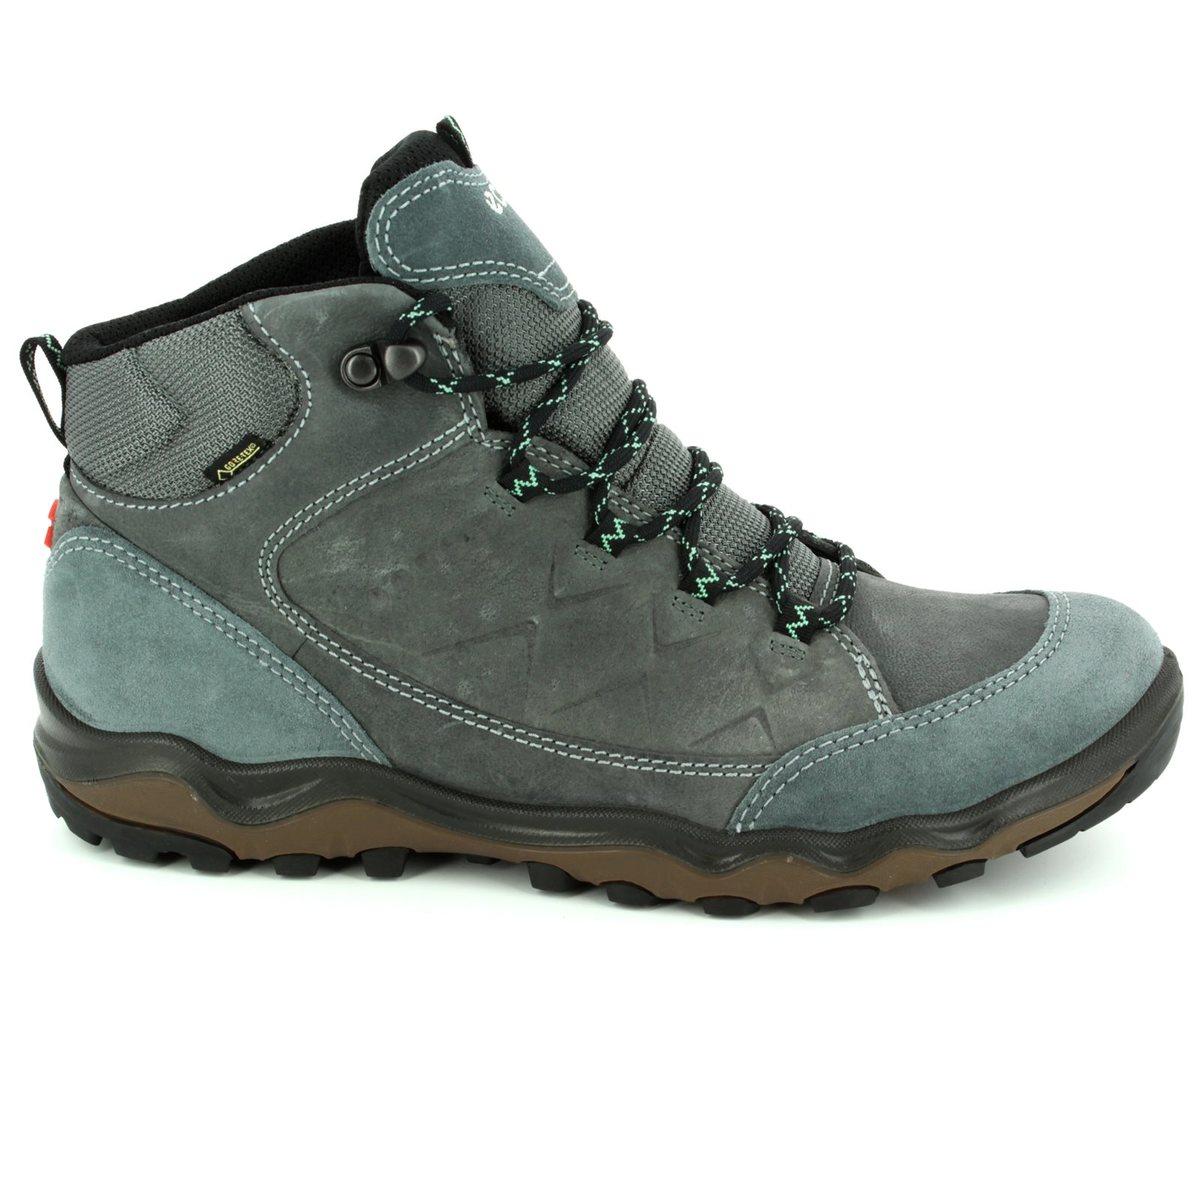 Ecco Gore Tex Walking Shoes